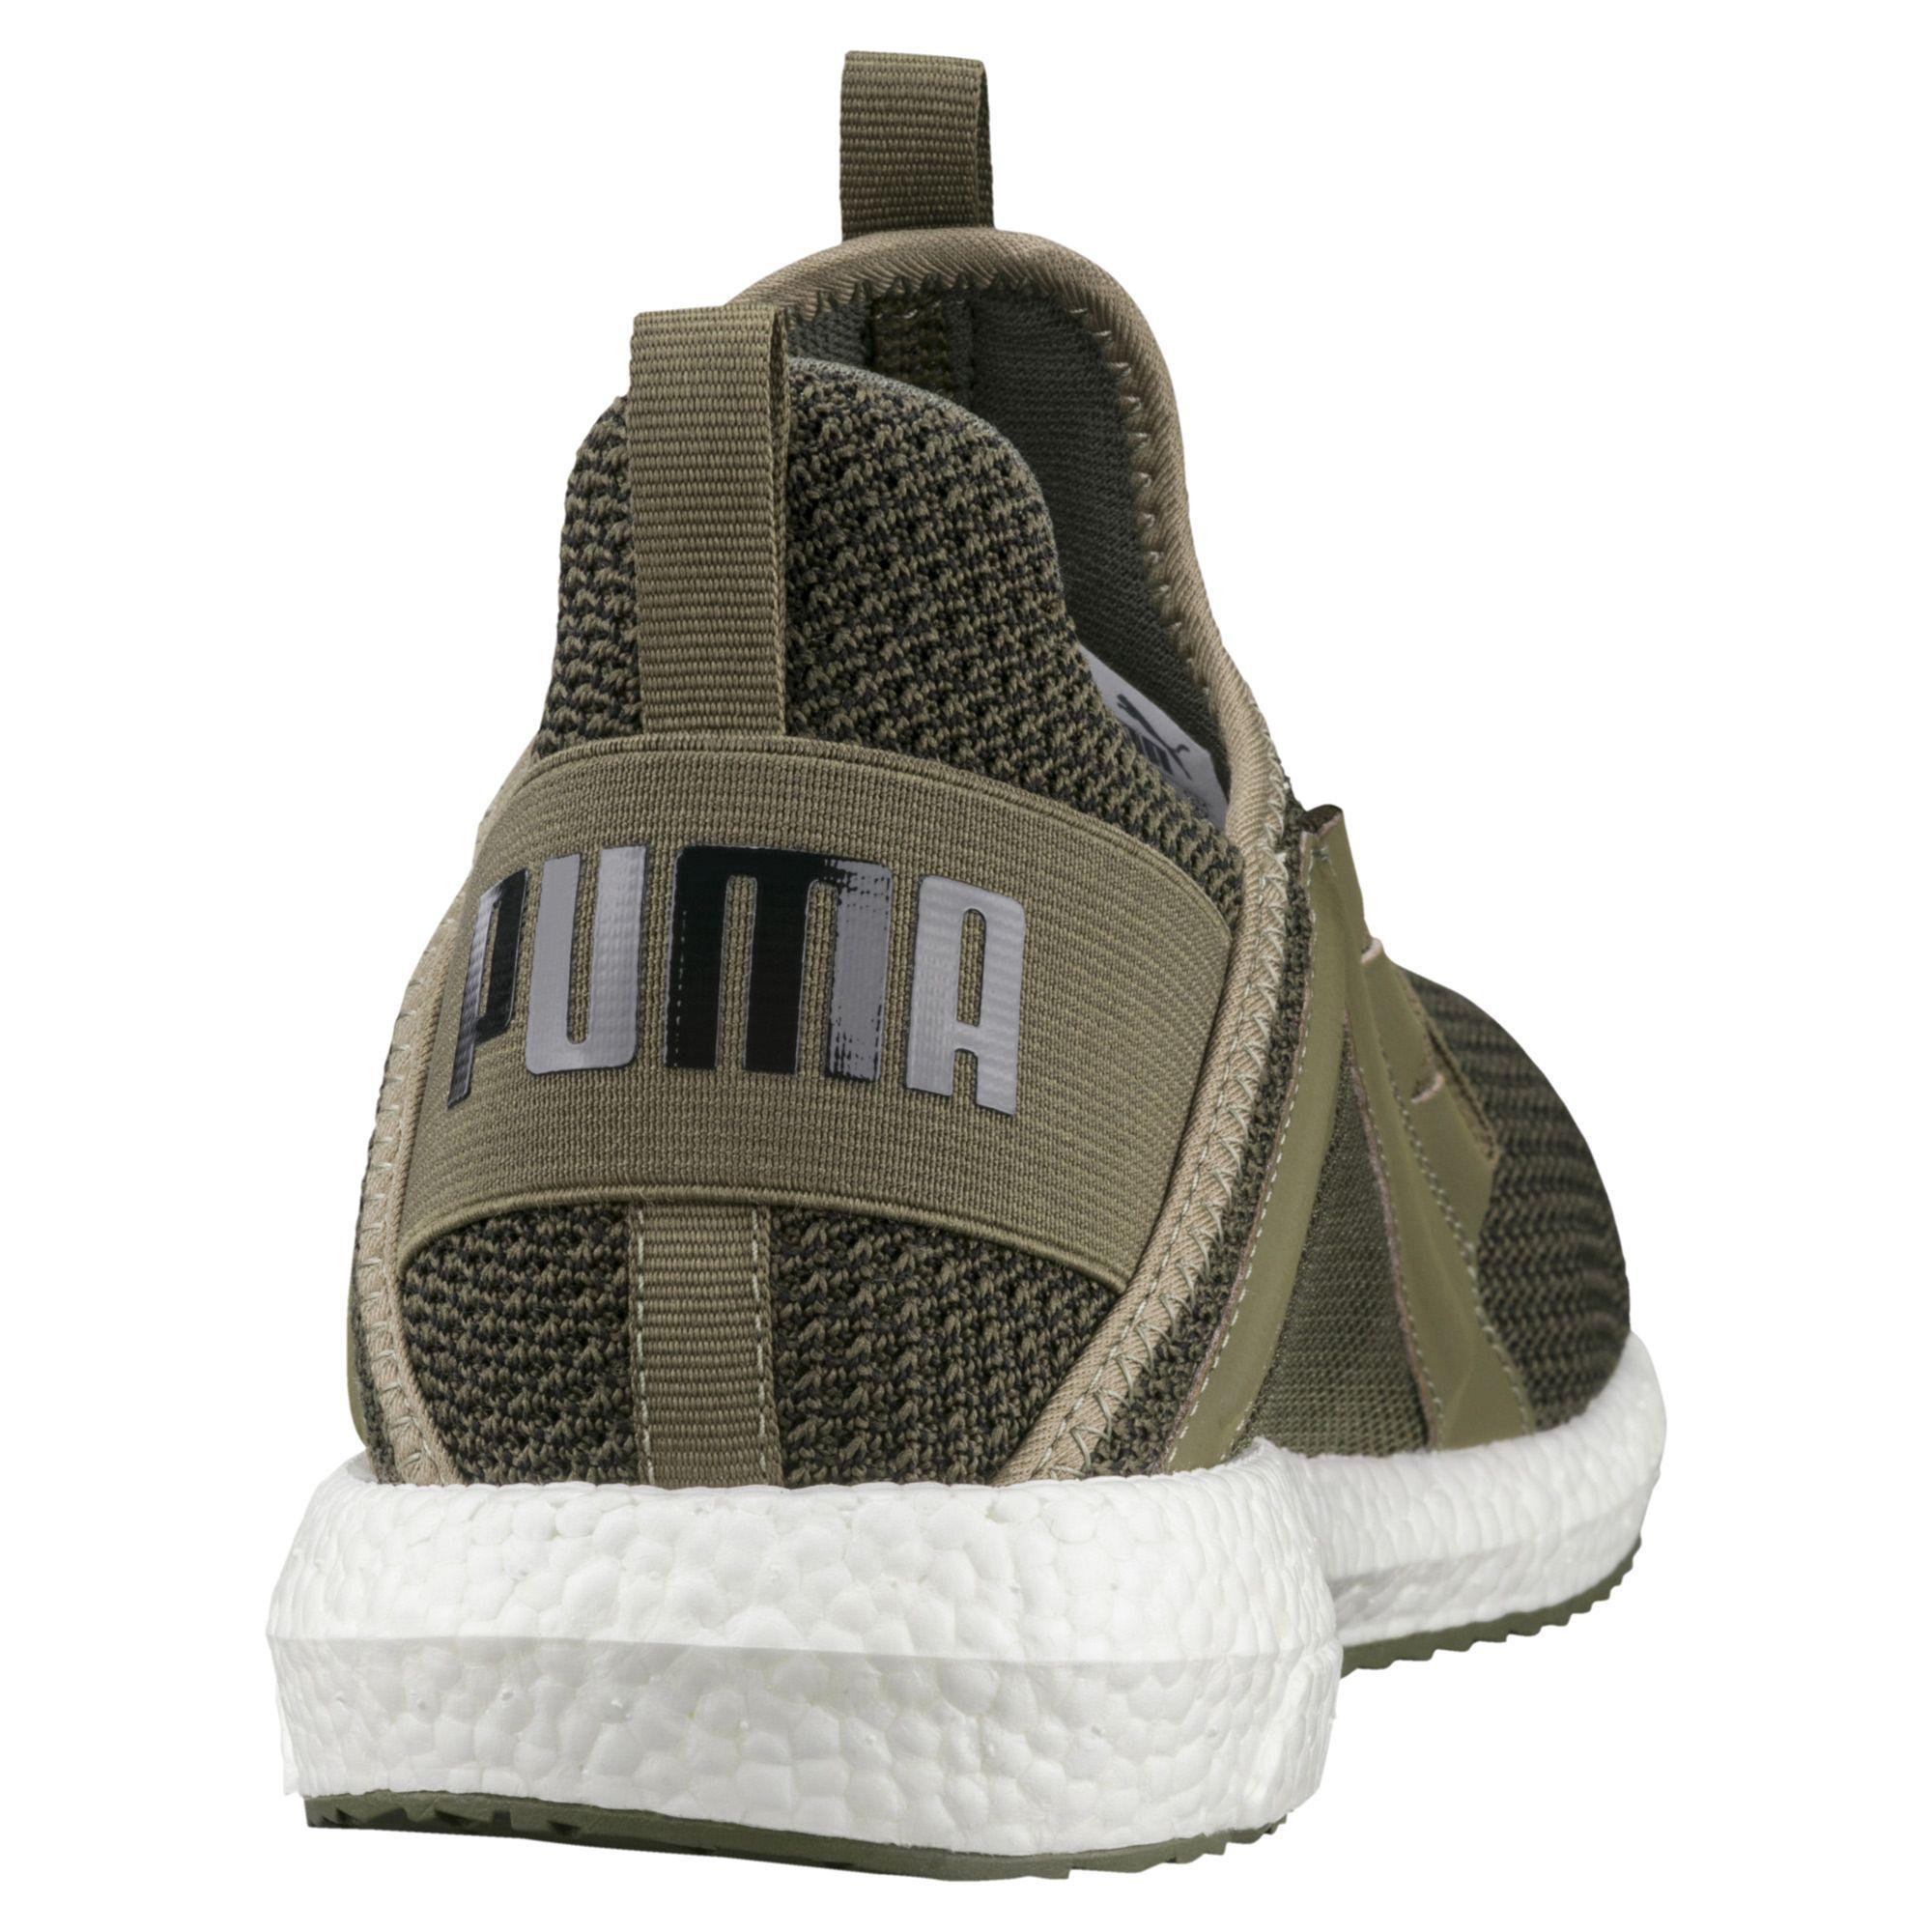 0c0e4f983ff Lyst - PUMA Mega Nrgy Knit Men s Running Shoes for Men